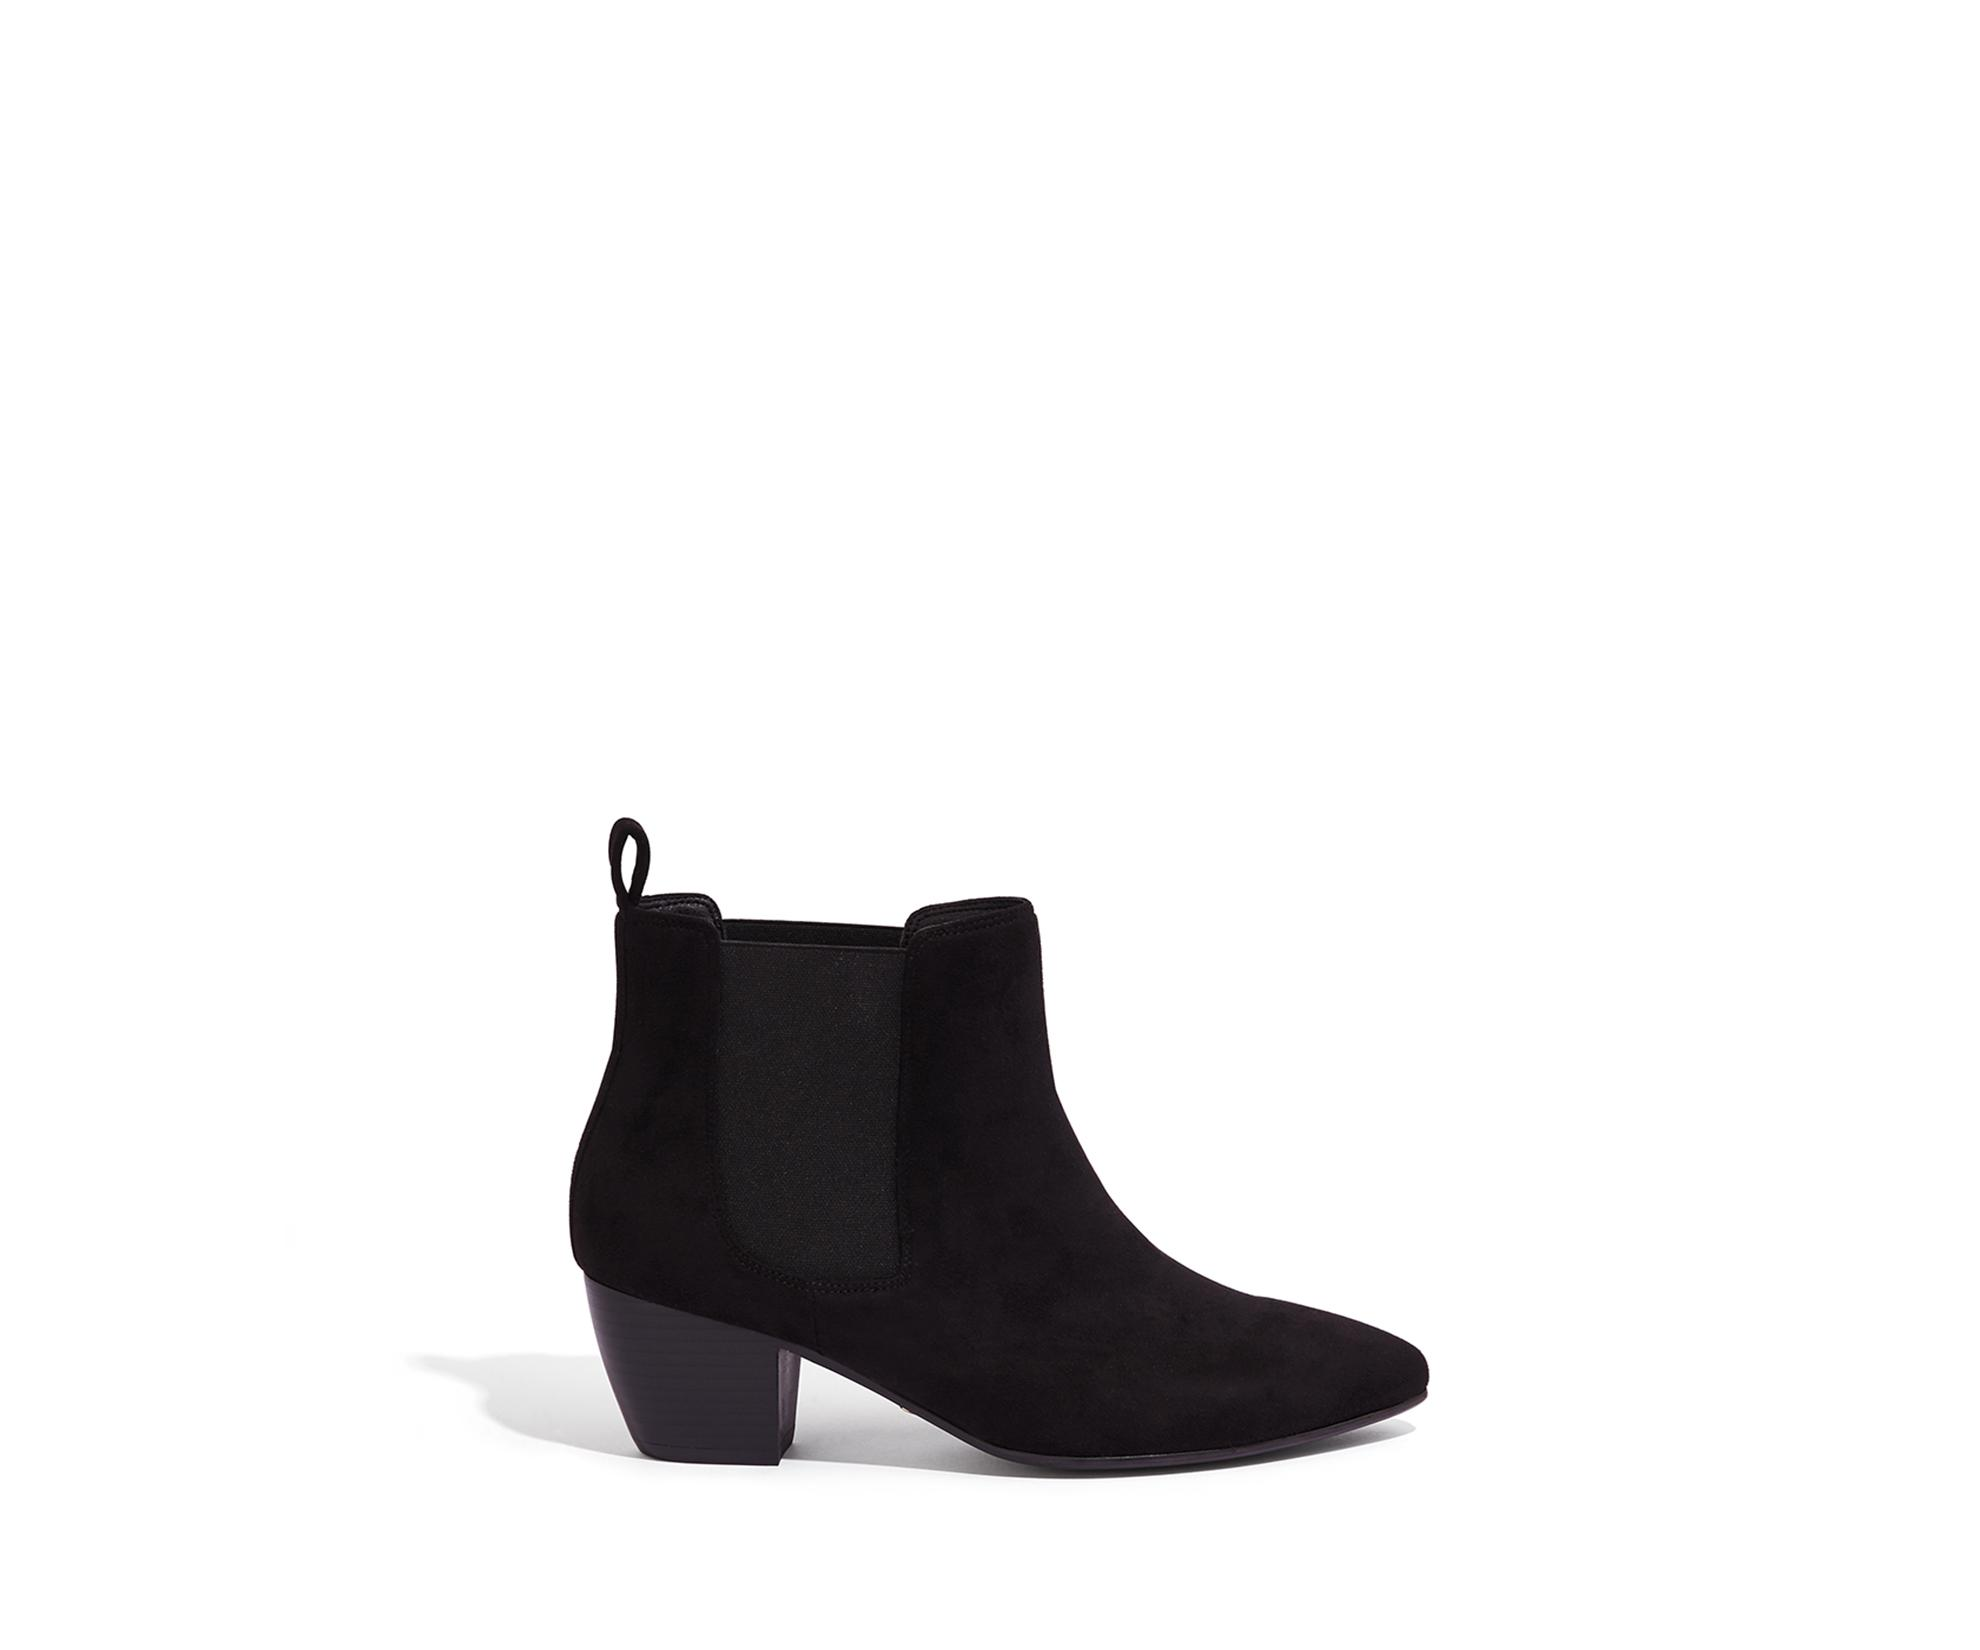 44f591e667d3 Oasis Camilla Cuban Heel Boot in Black - Lyst